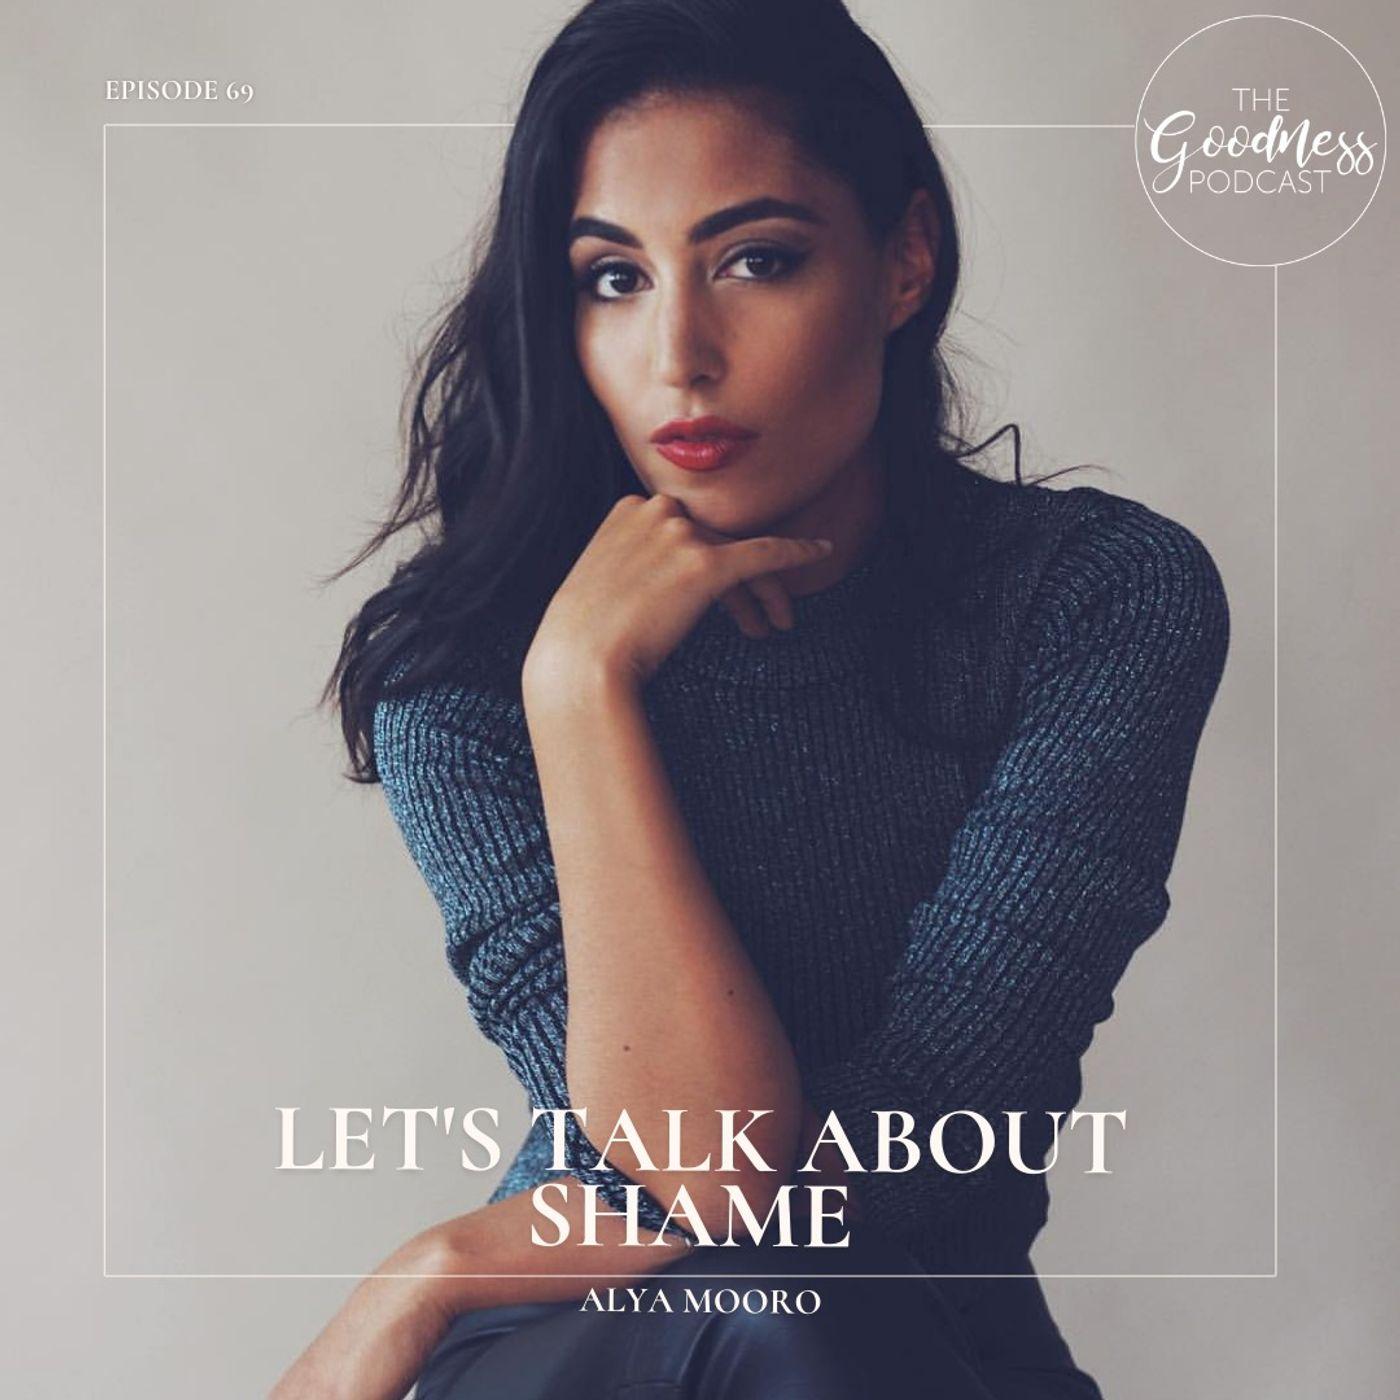 Alya Mooro: Let's Talk About Shame